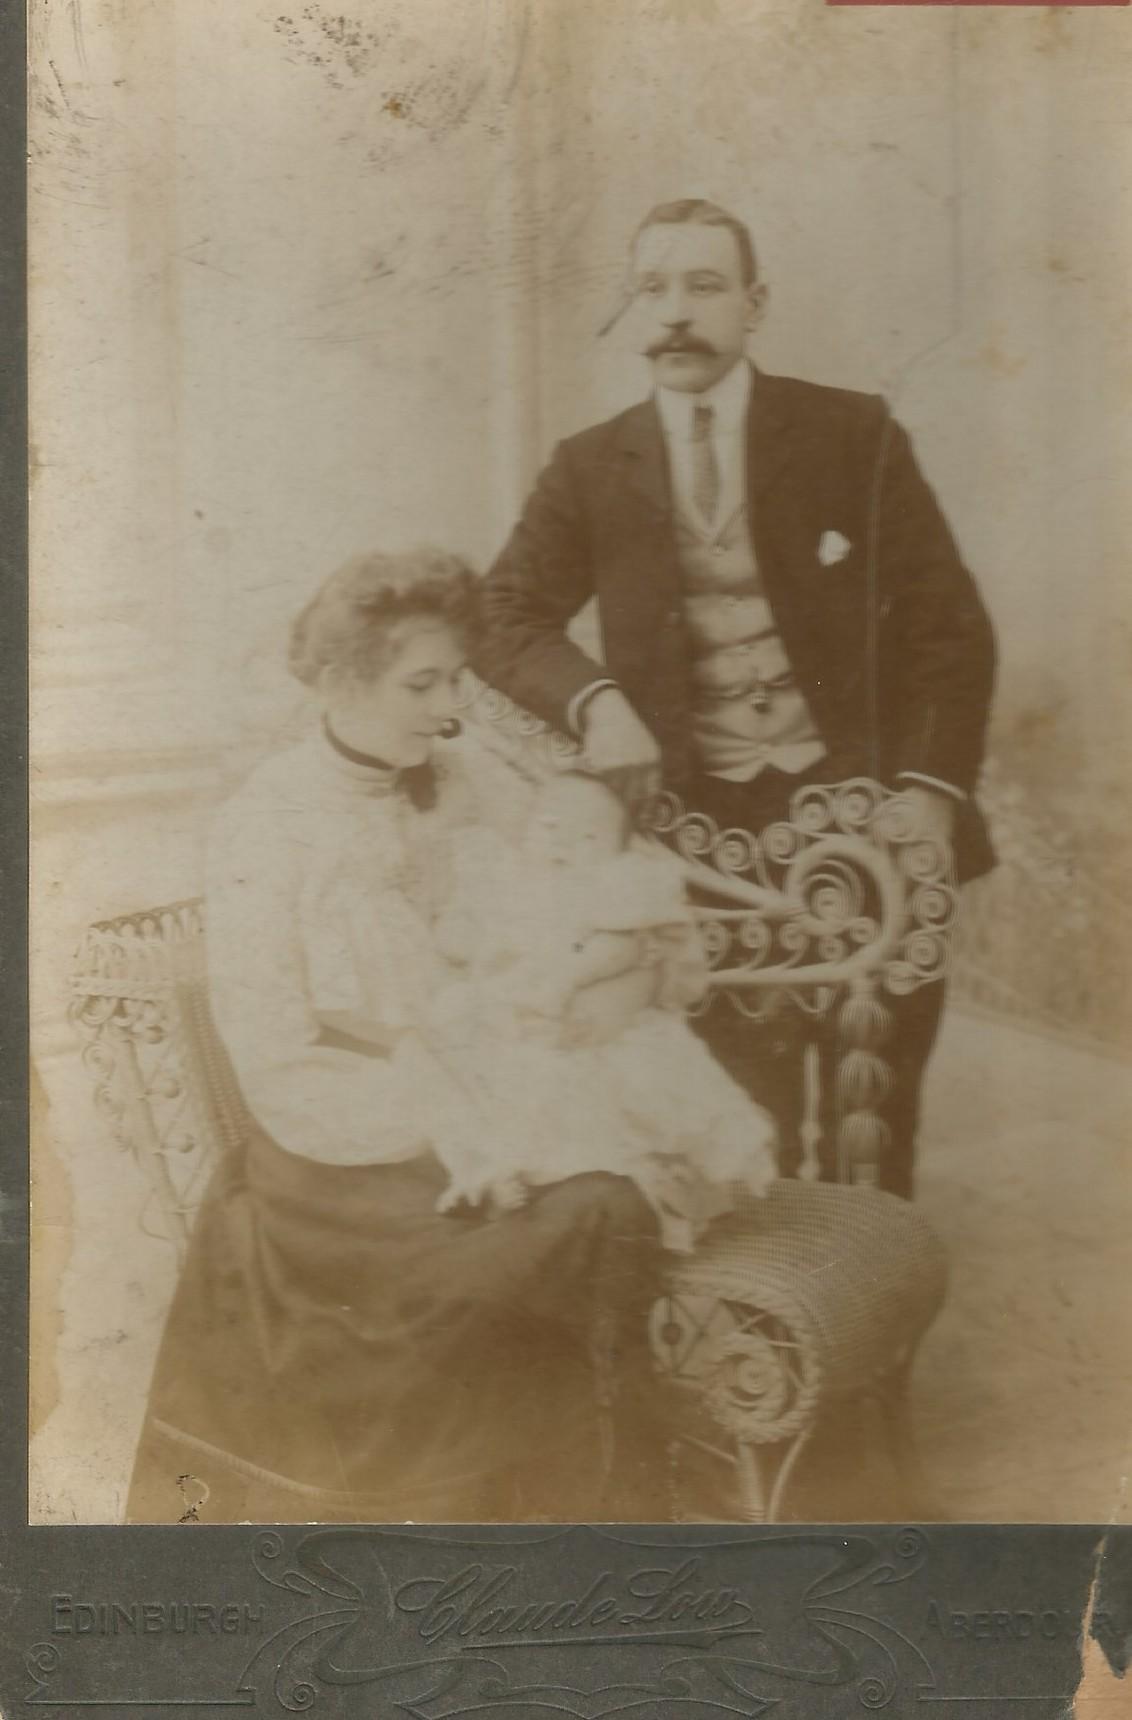 Granny & Grandad Bain with their newborn